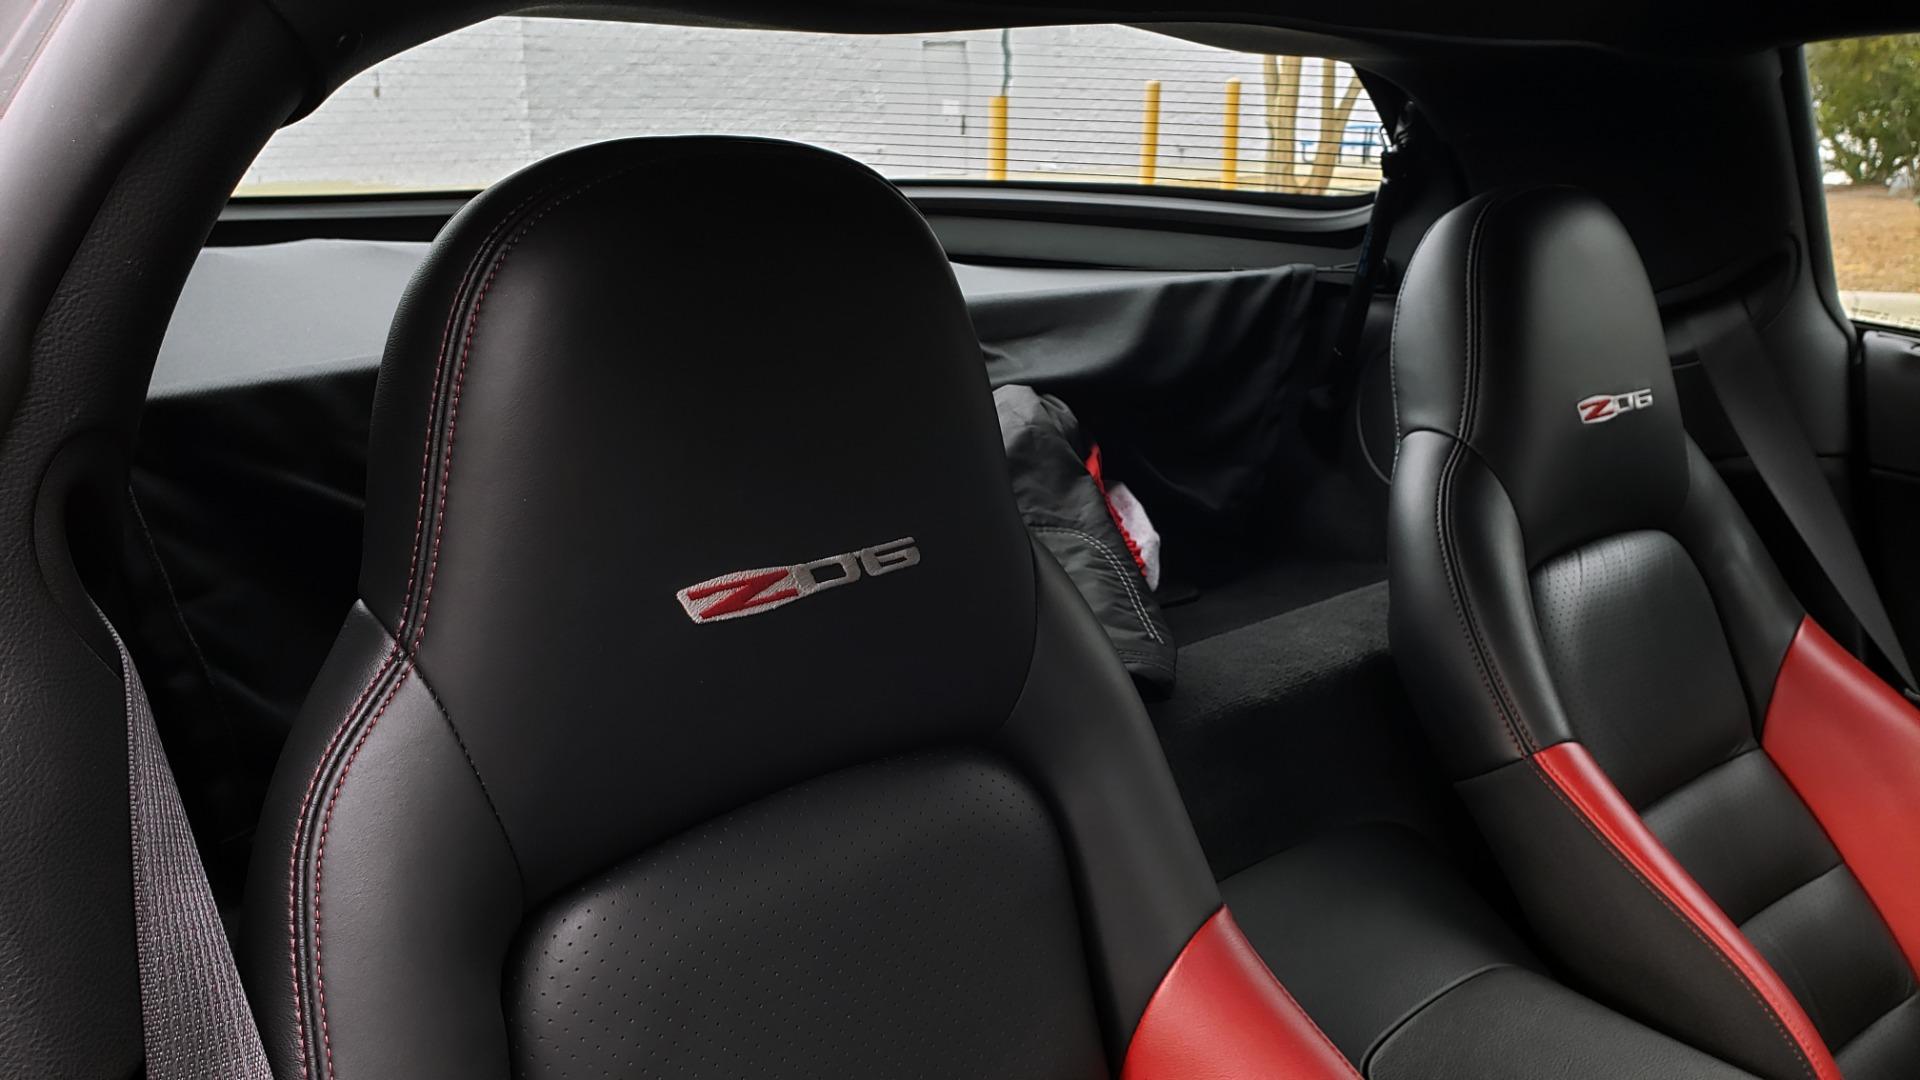 Used 2007 Chevrolet CORVETTE Z06 2LZ / 7.0L 427 V8 / 6-SPD MAN / BOSE / POLISHED WHEELS for sale Sold at Formula Imports in Charlotte NC 28227 85